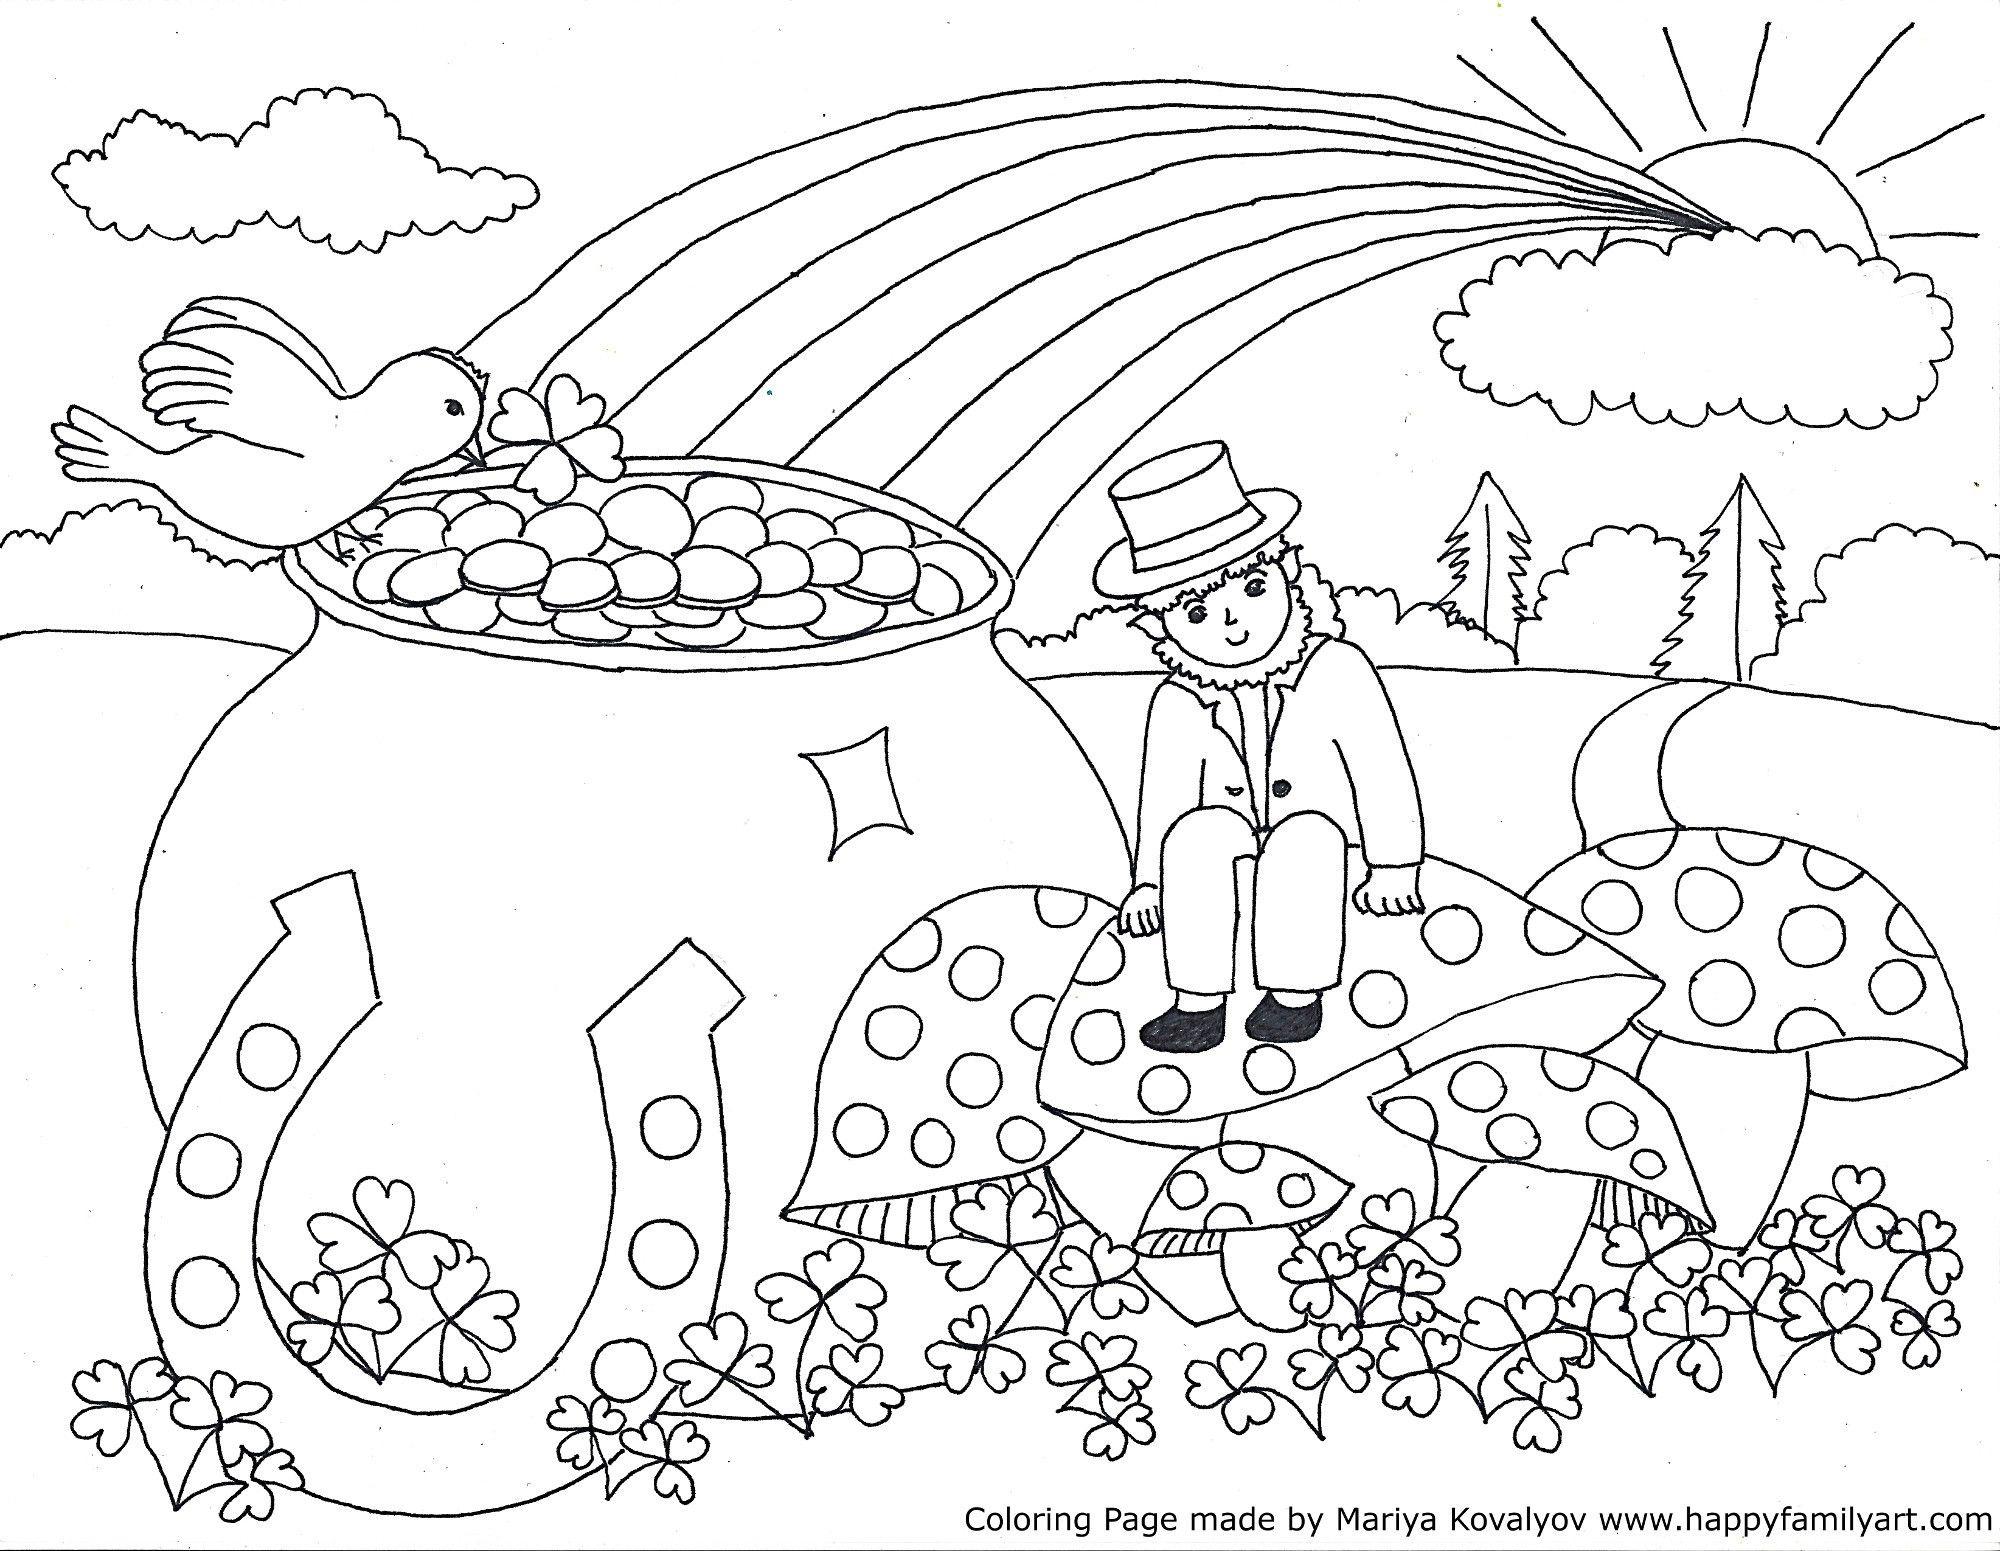 Stpatriksmedium - | Coloring Pages | Color, St Patrick, Coloring Pages - Free Printable Saint Patrick Coloring Pages